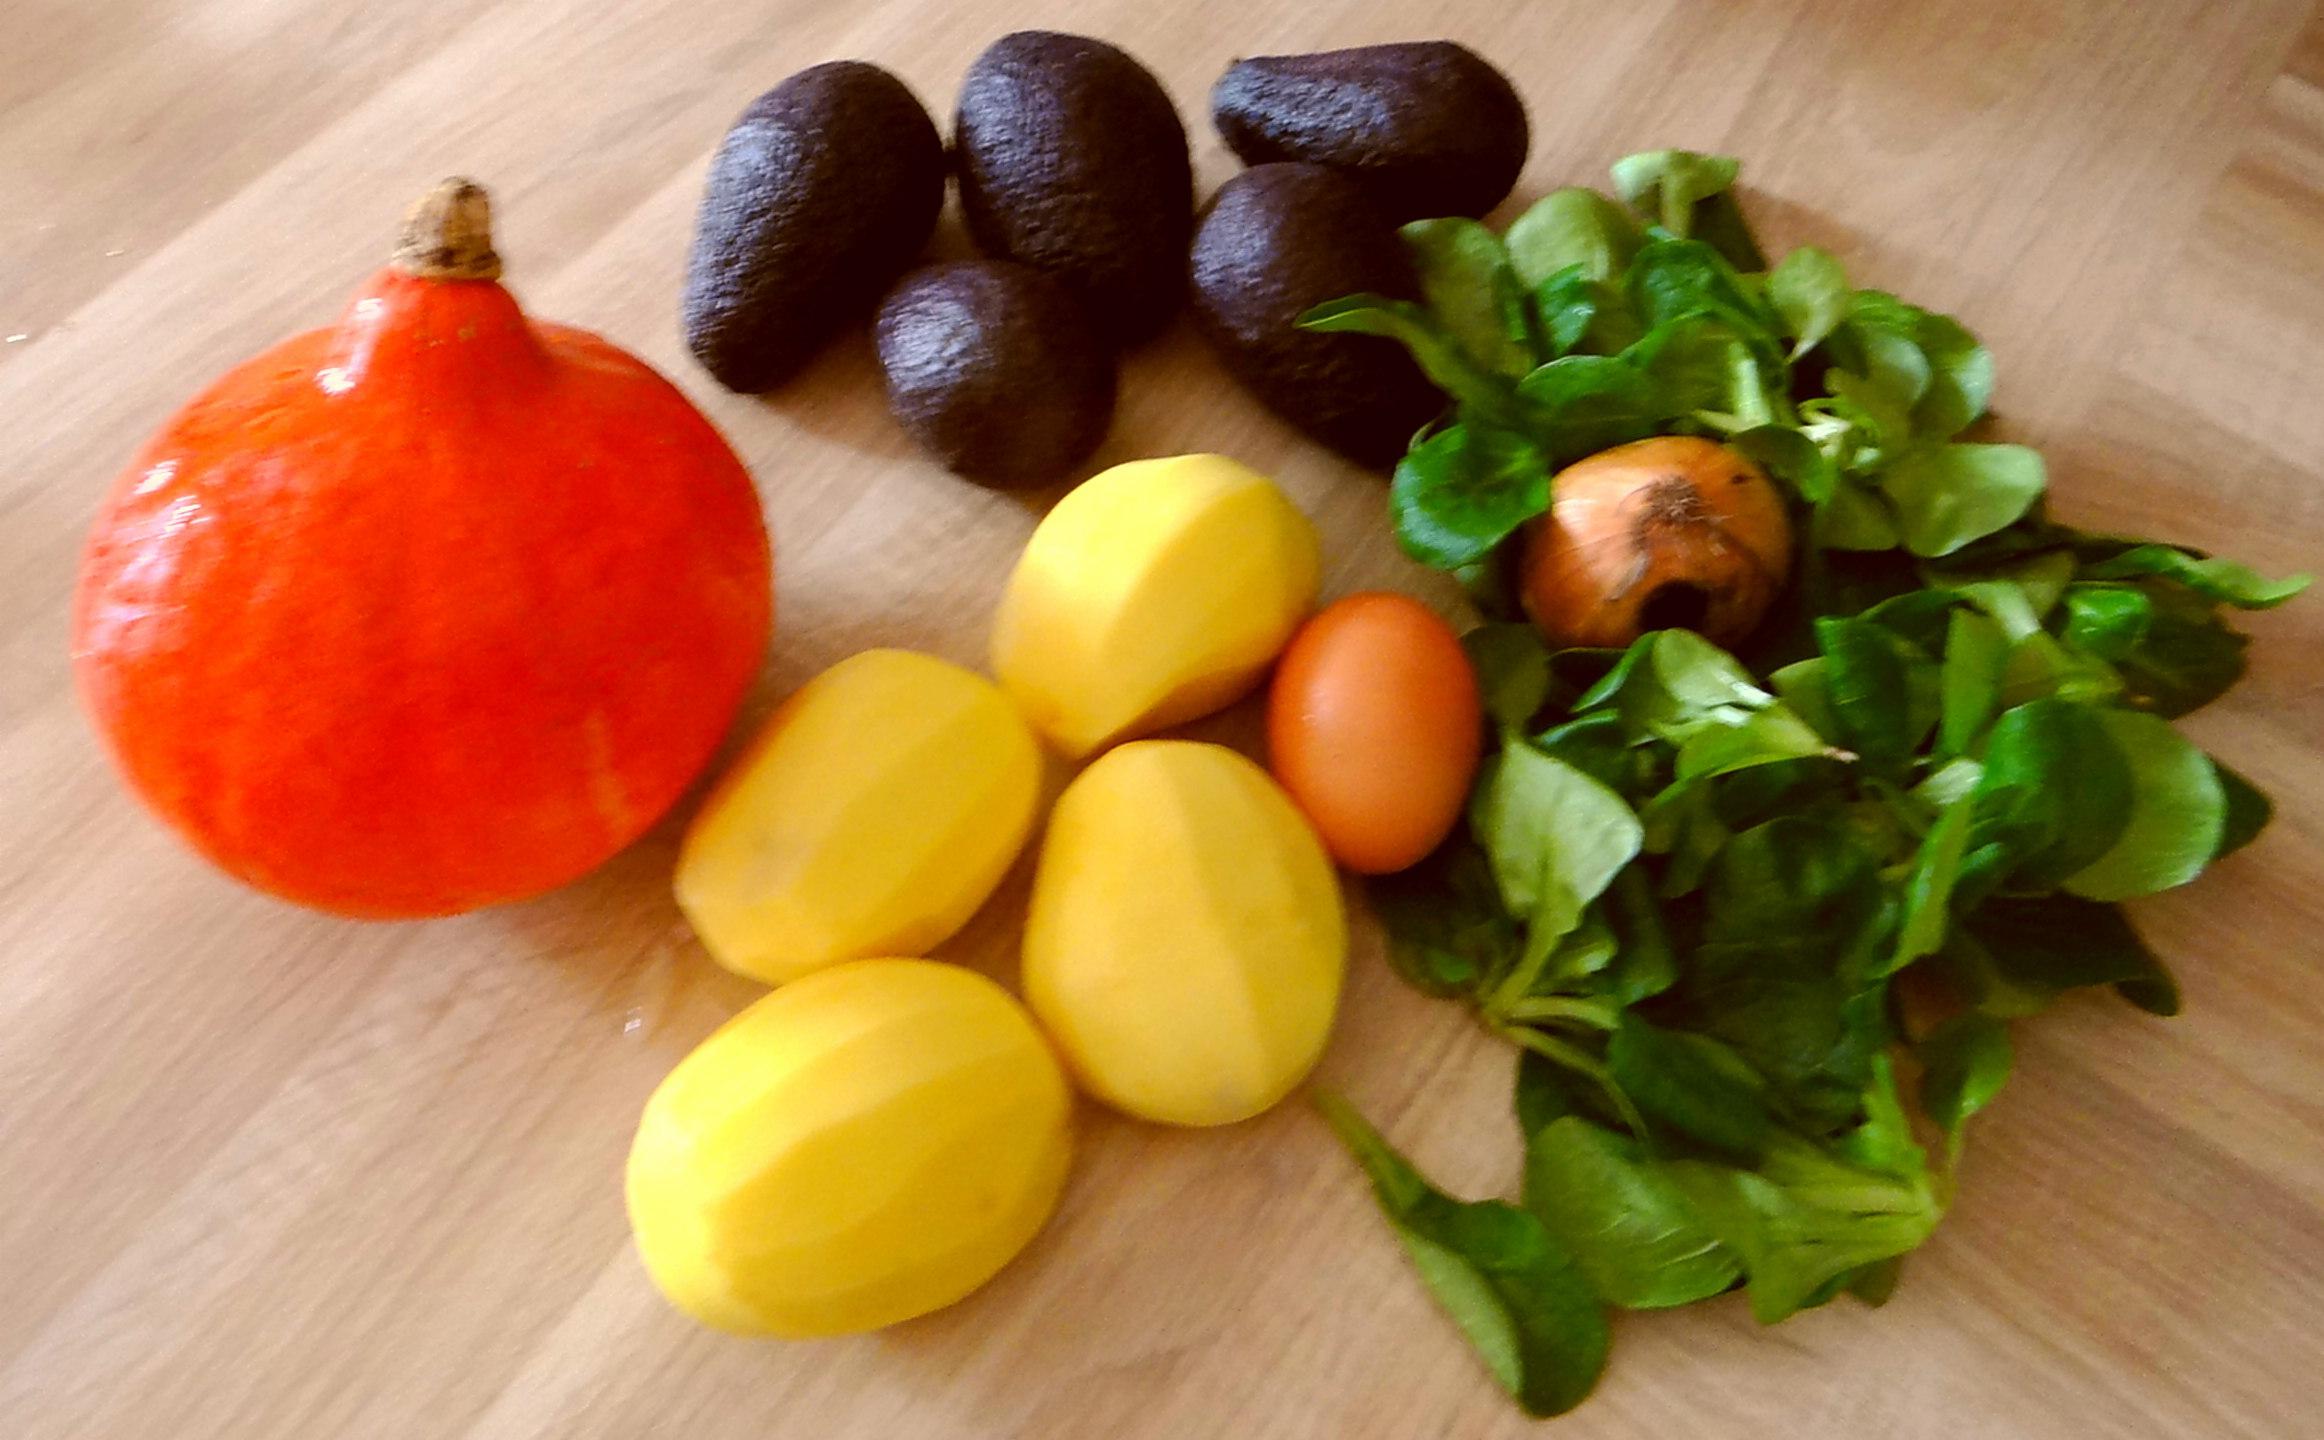 Kürbis-Kartoffel Puffer,Guacamole,Feldsalat (6)